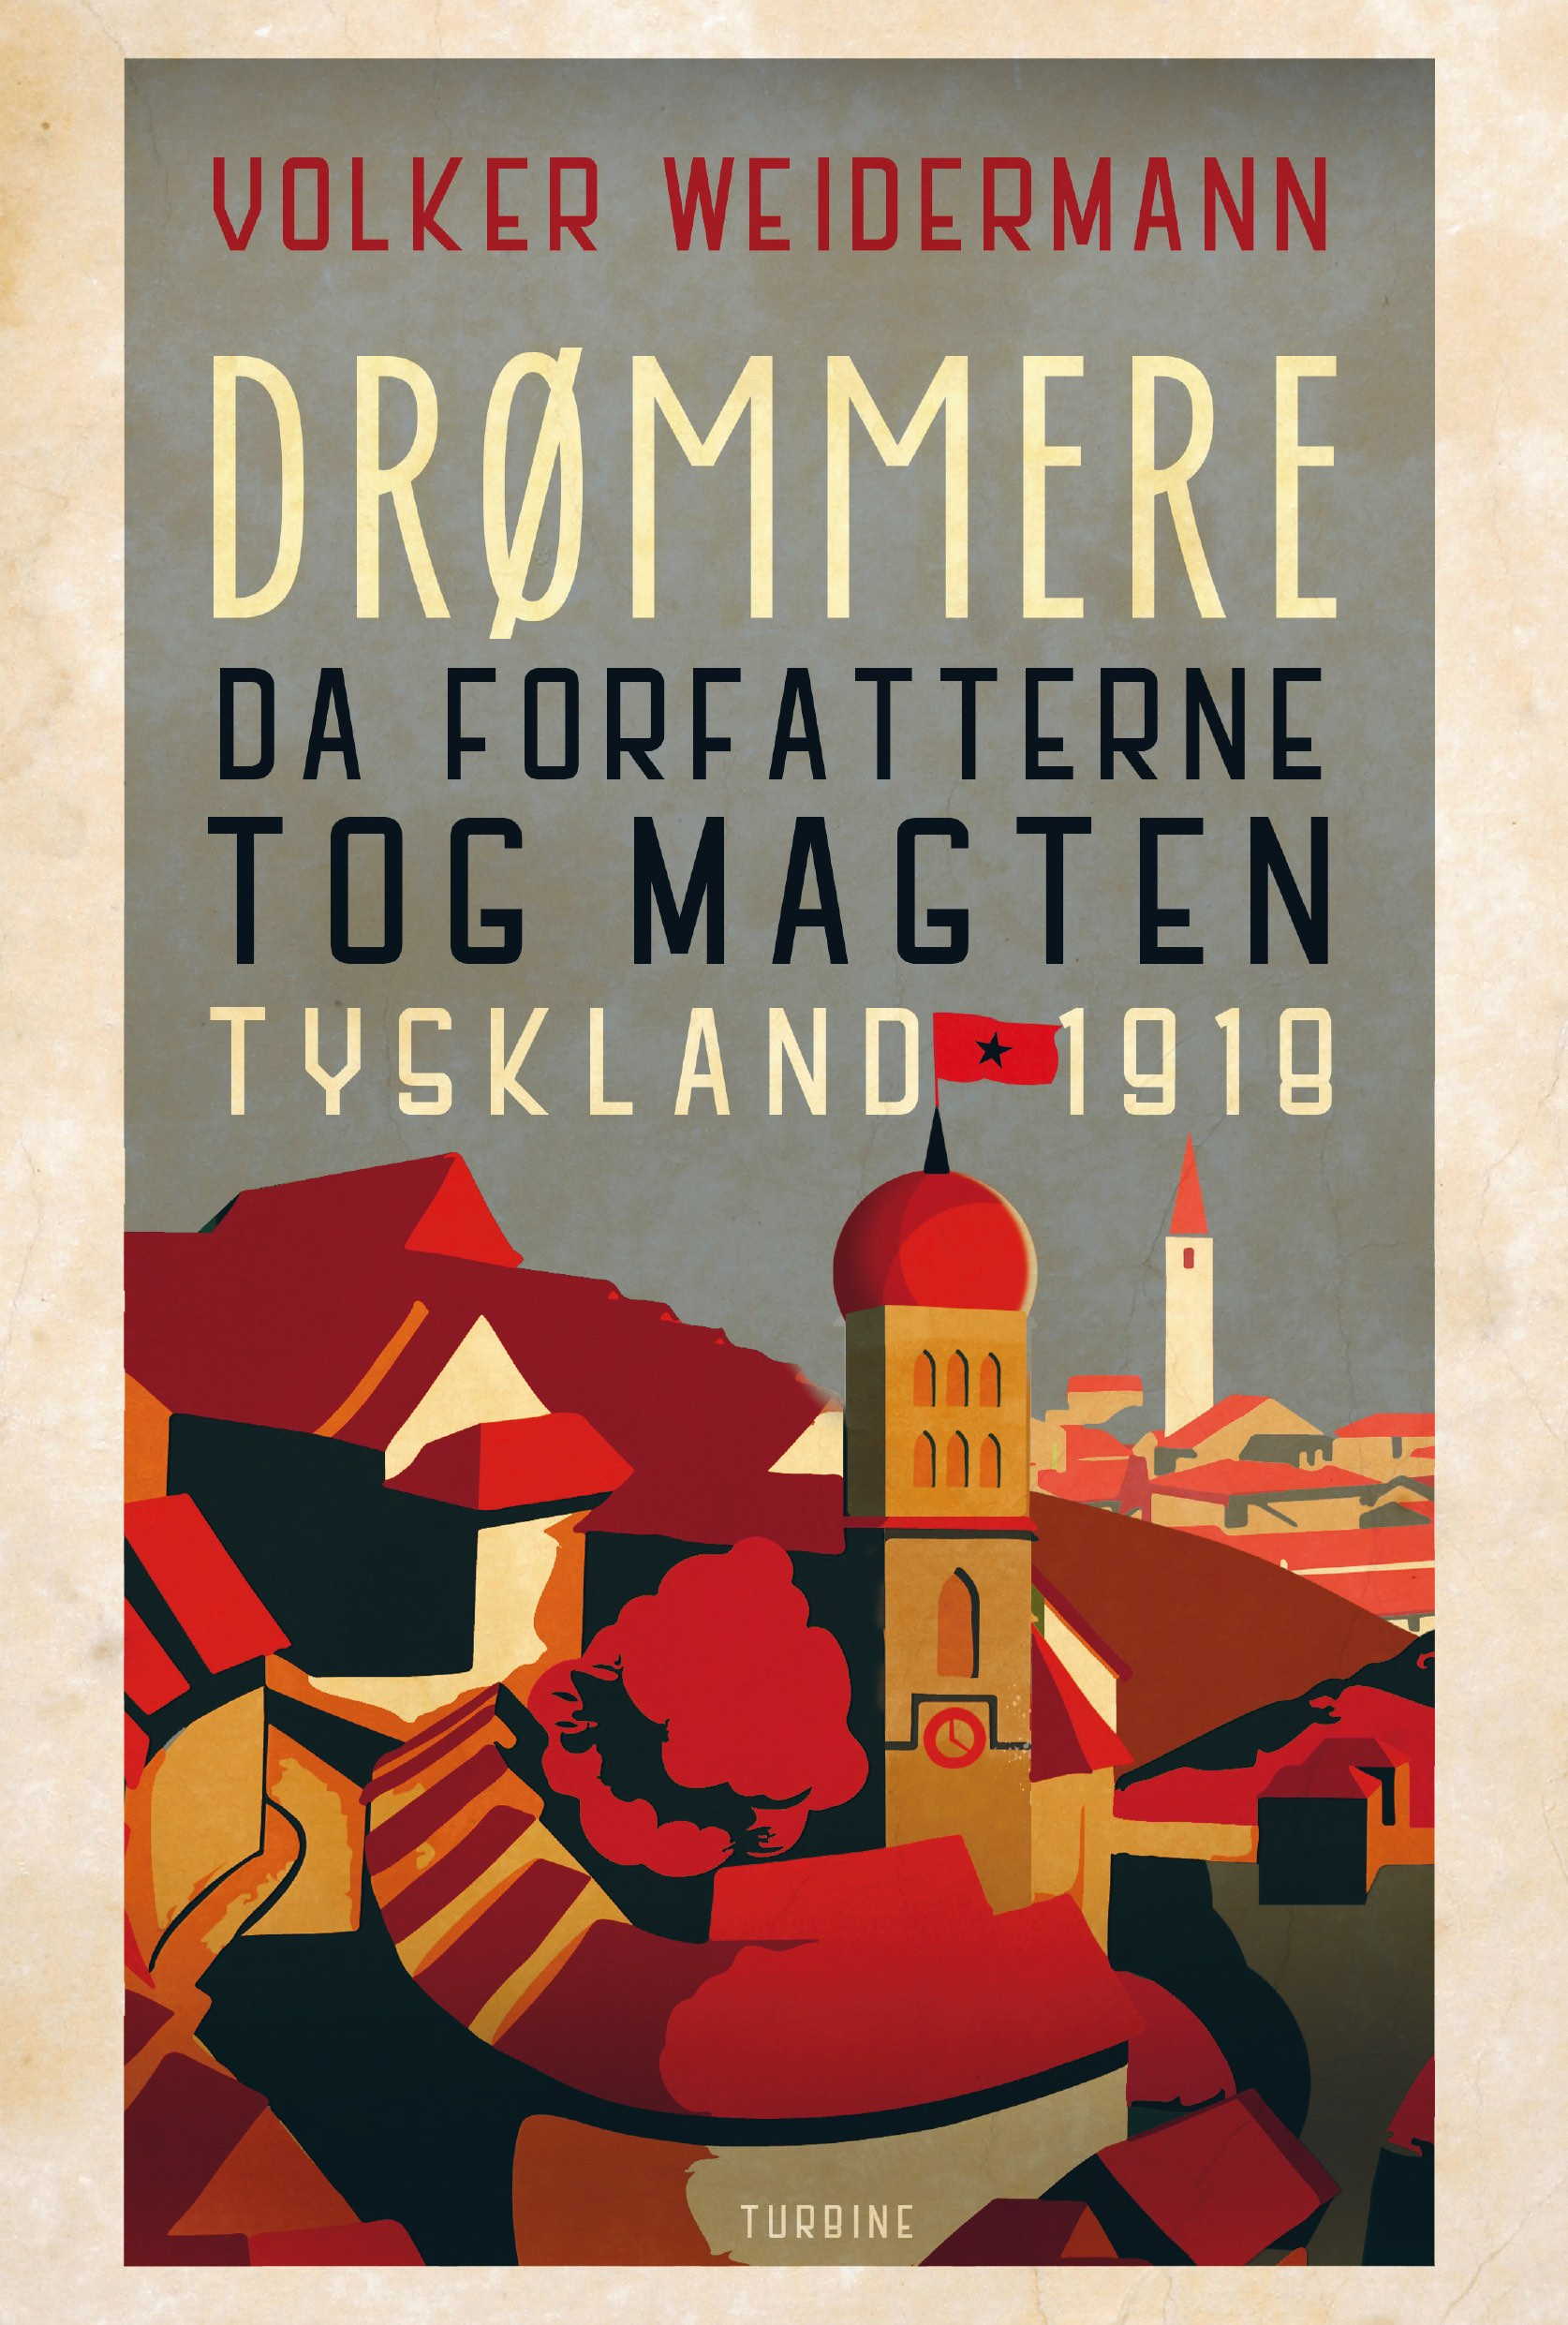 Drømmere - Da forfatterne greb magten Tyskland 1918